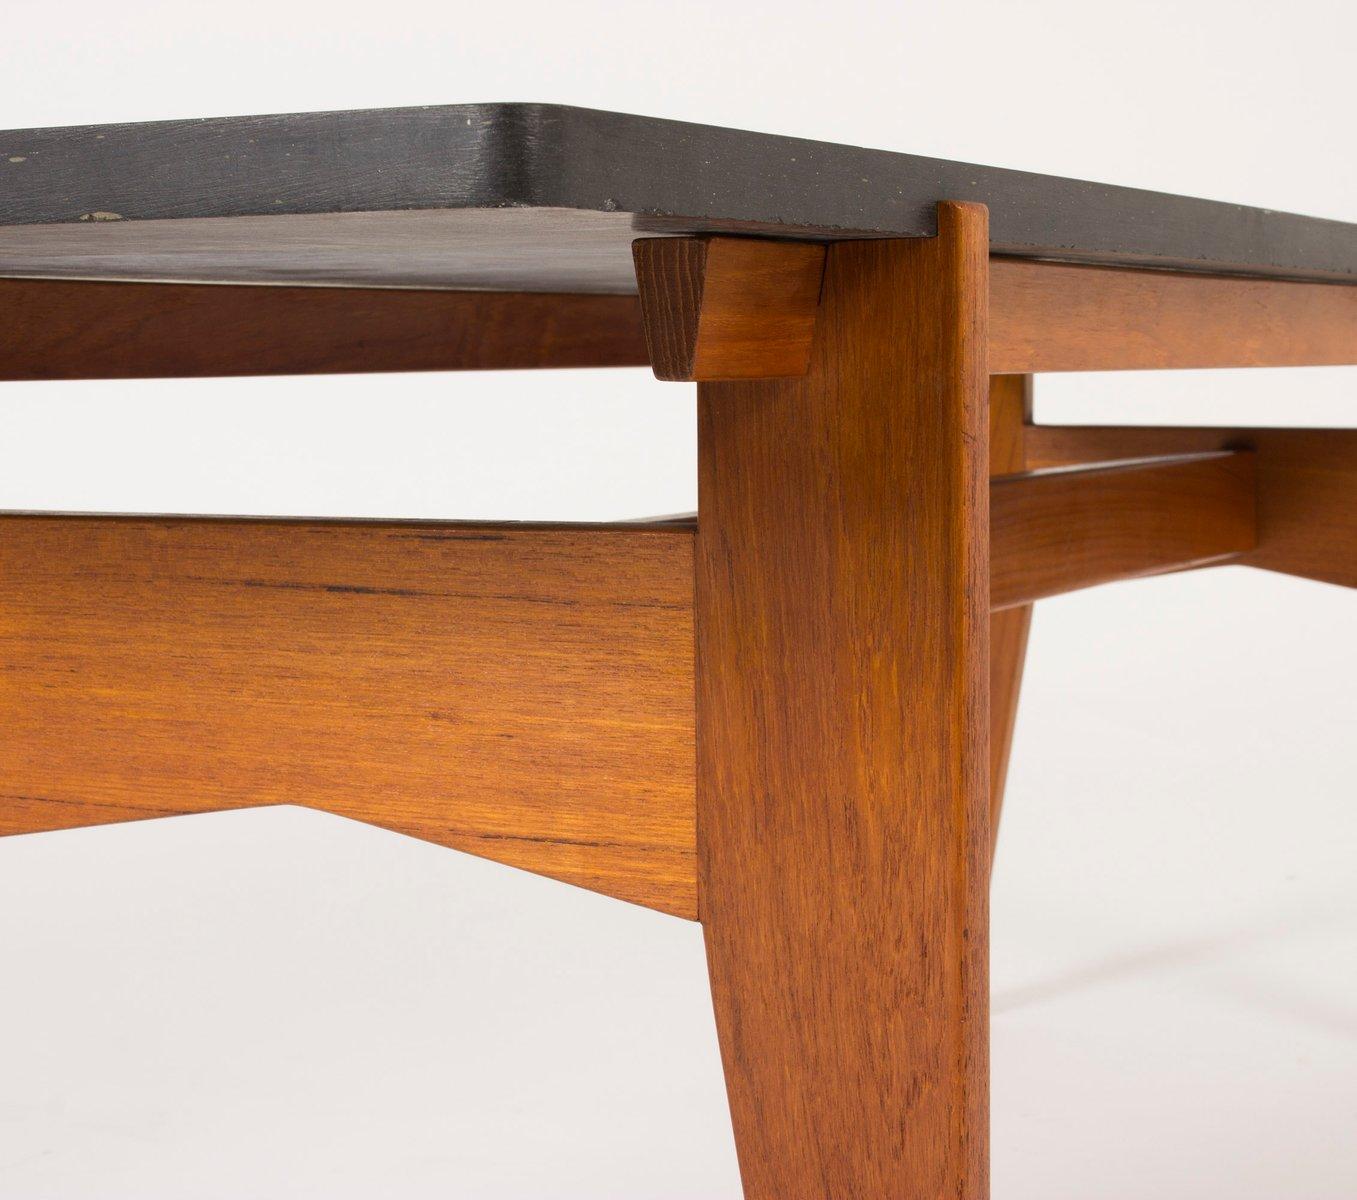 Dark Teak Coffee Table: Teak And Black Marble Coffee Table By Hans-Agne Jakobsson